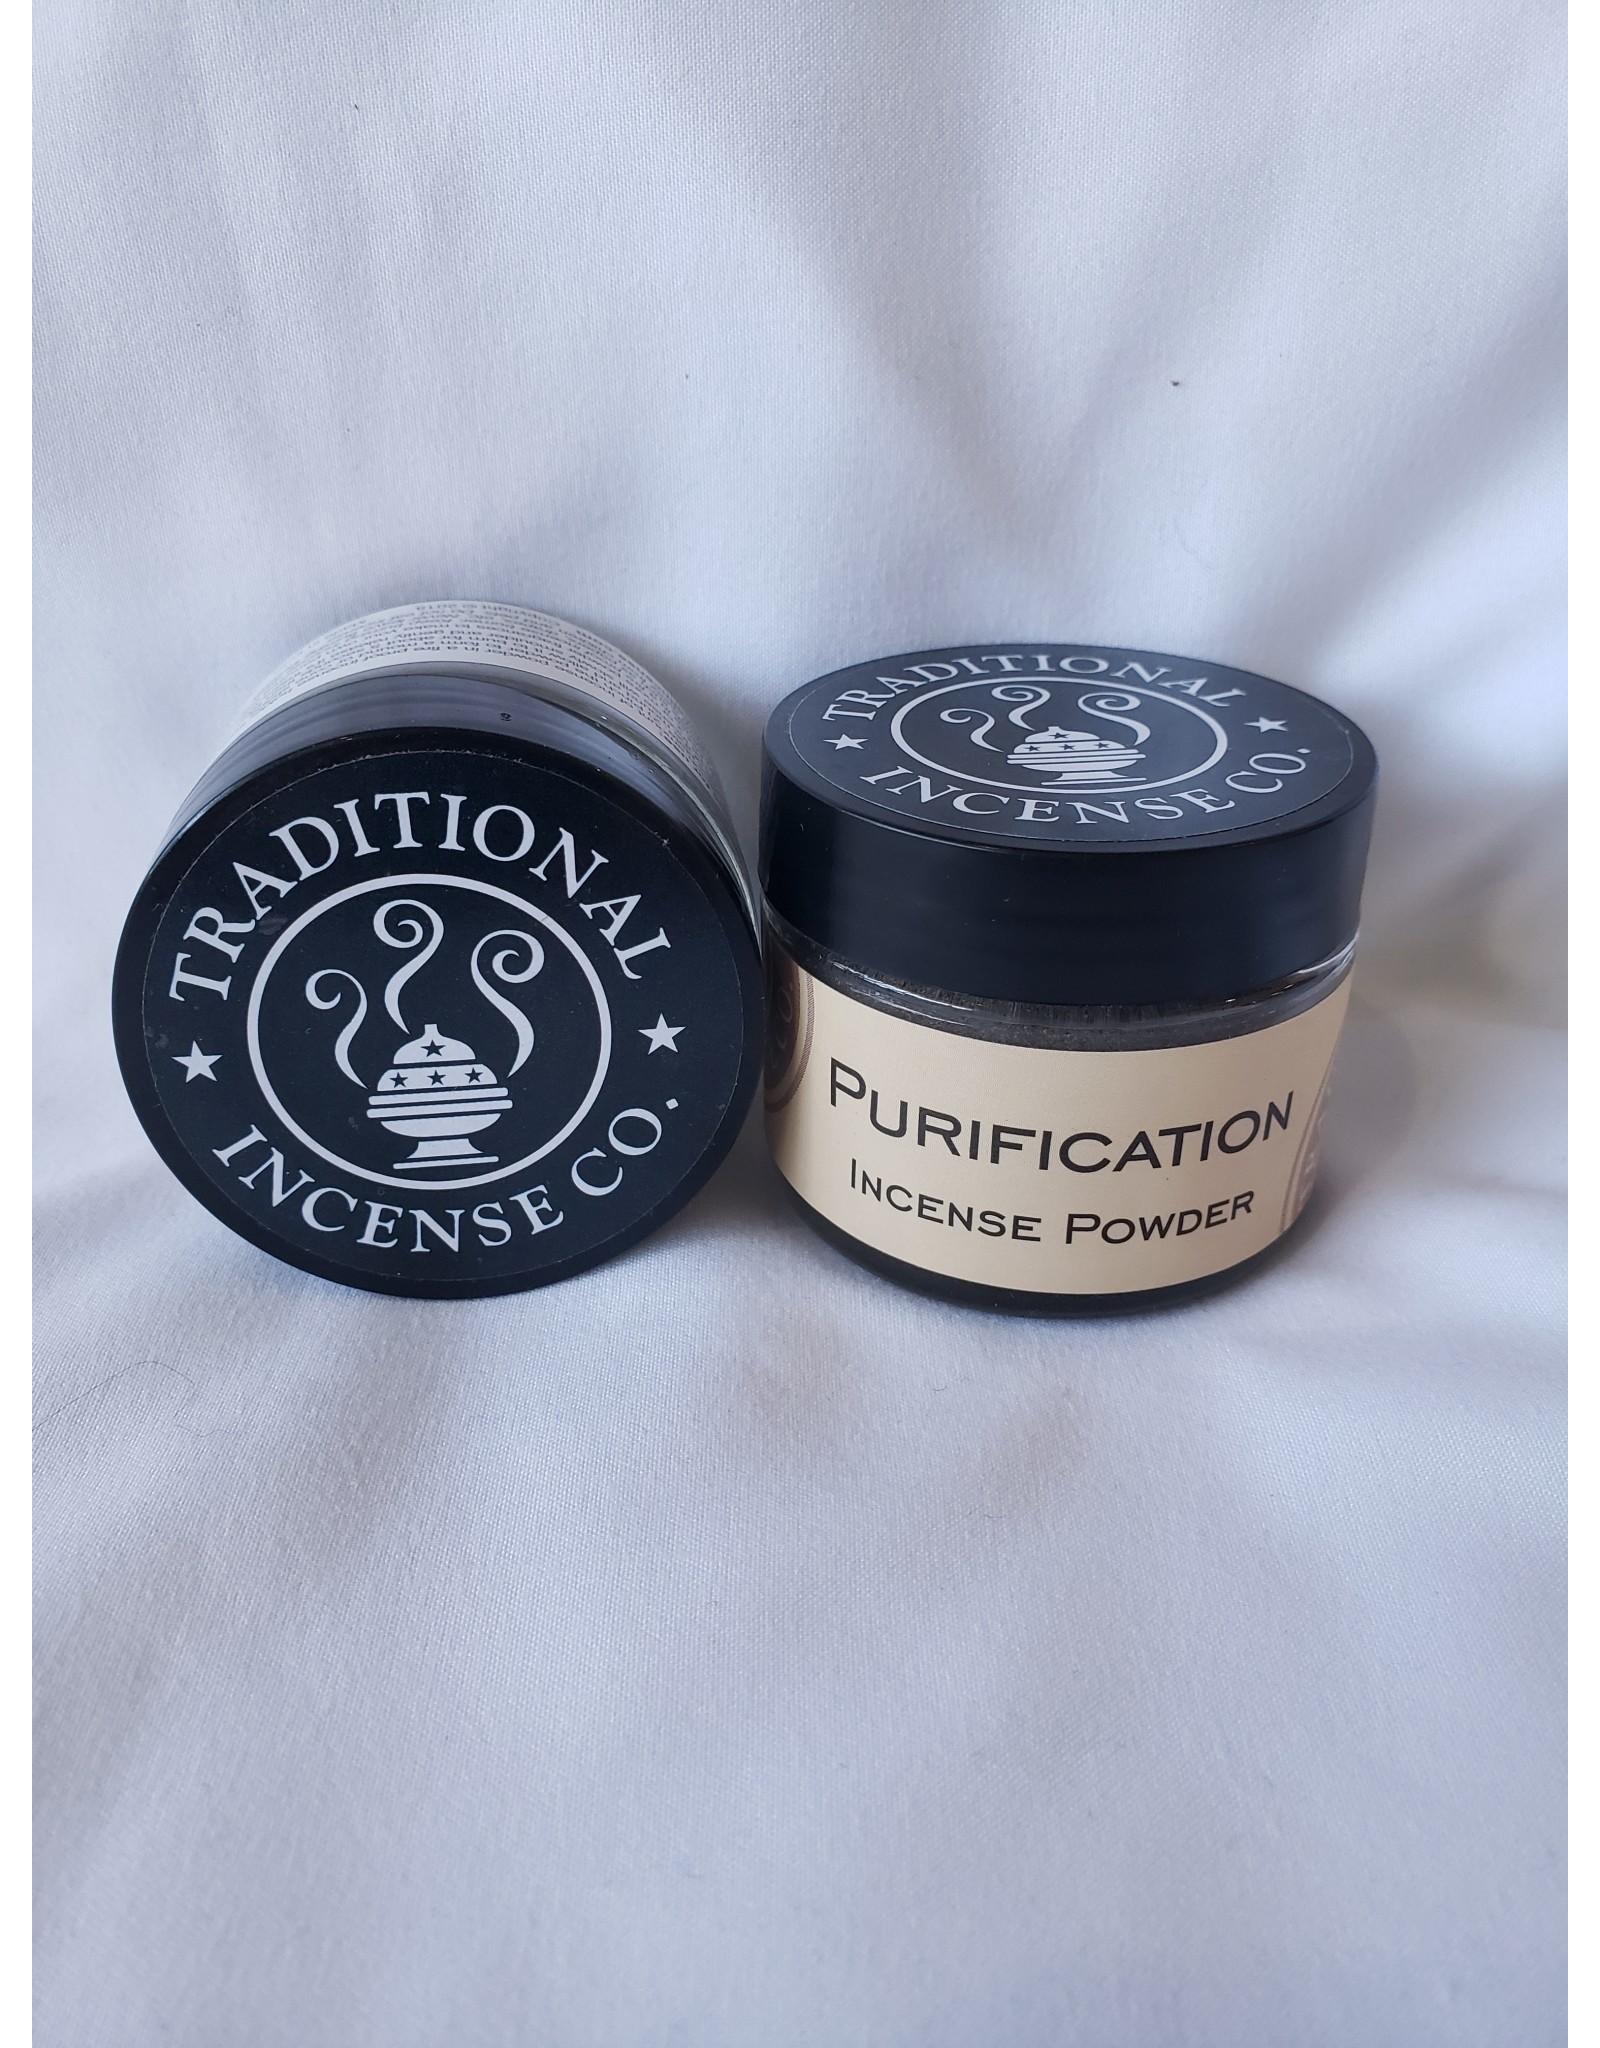 Purification Incense Powder